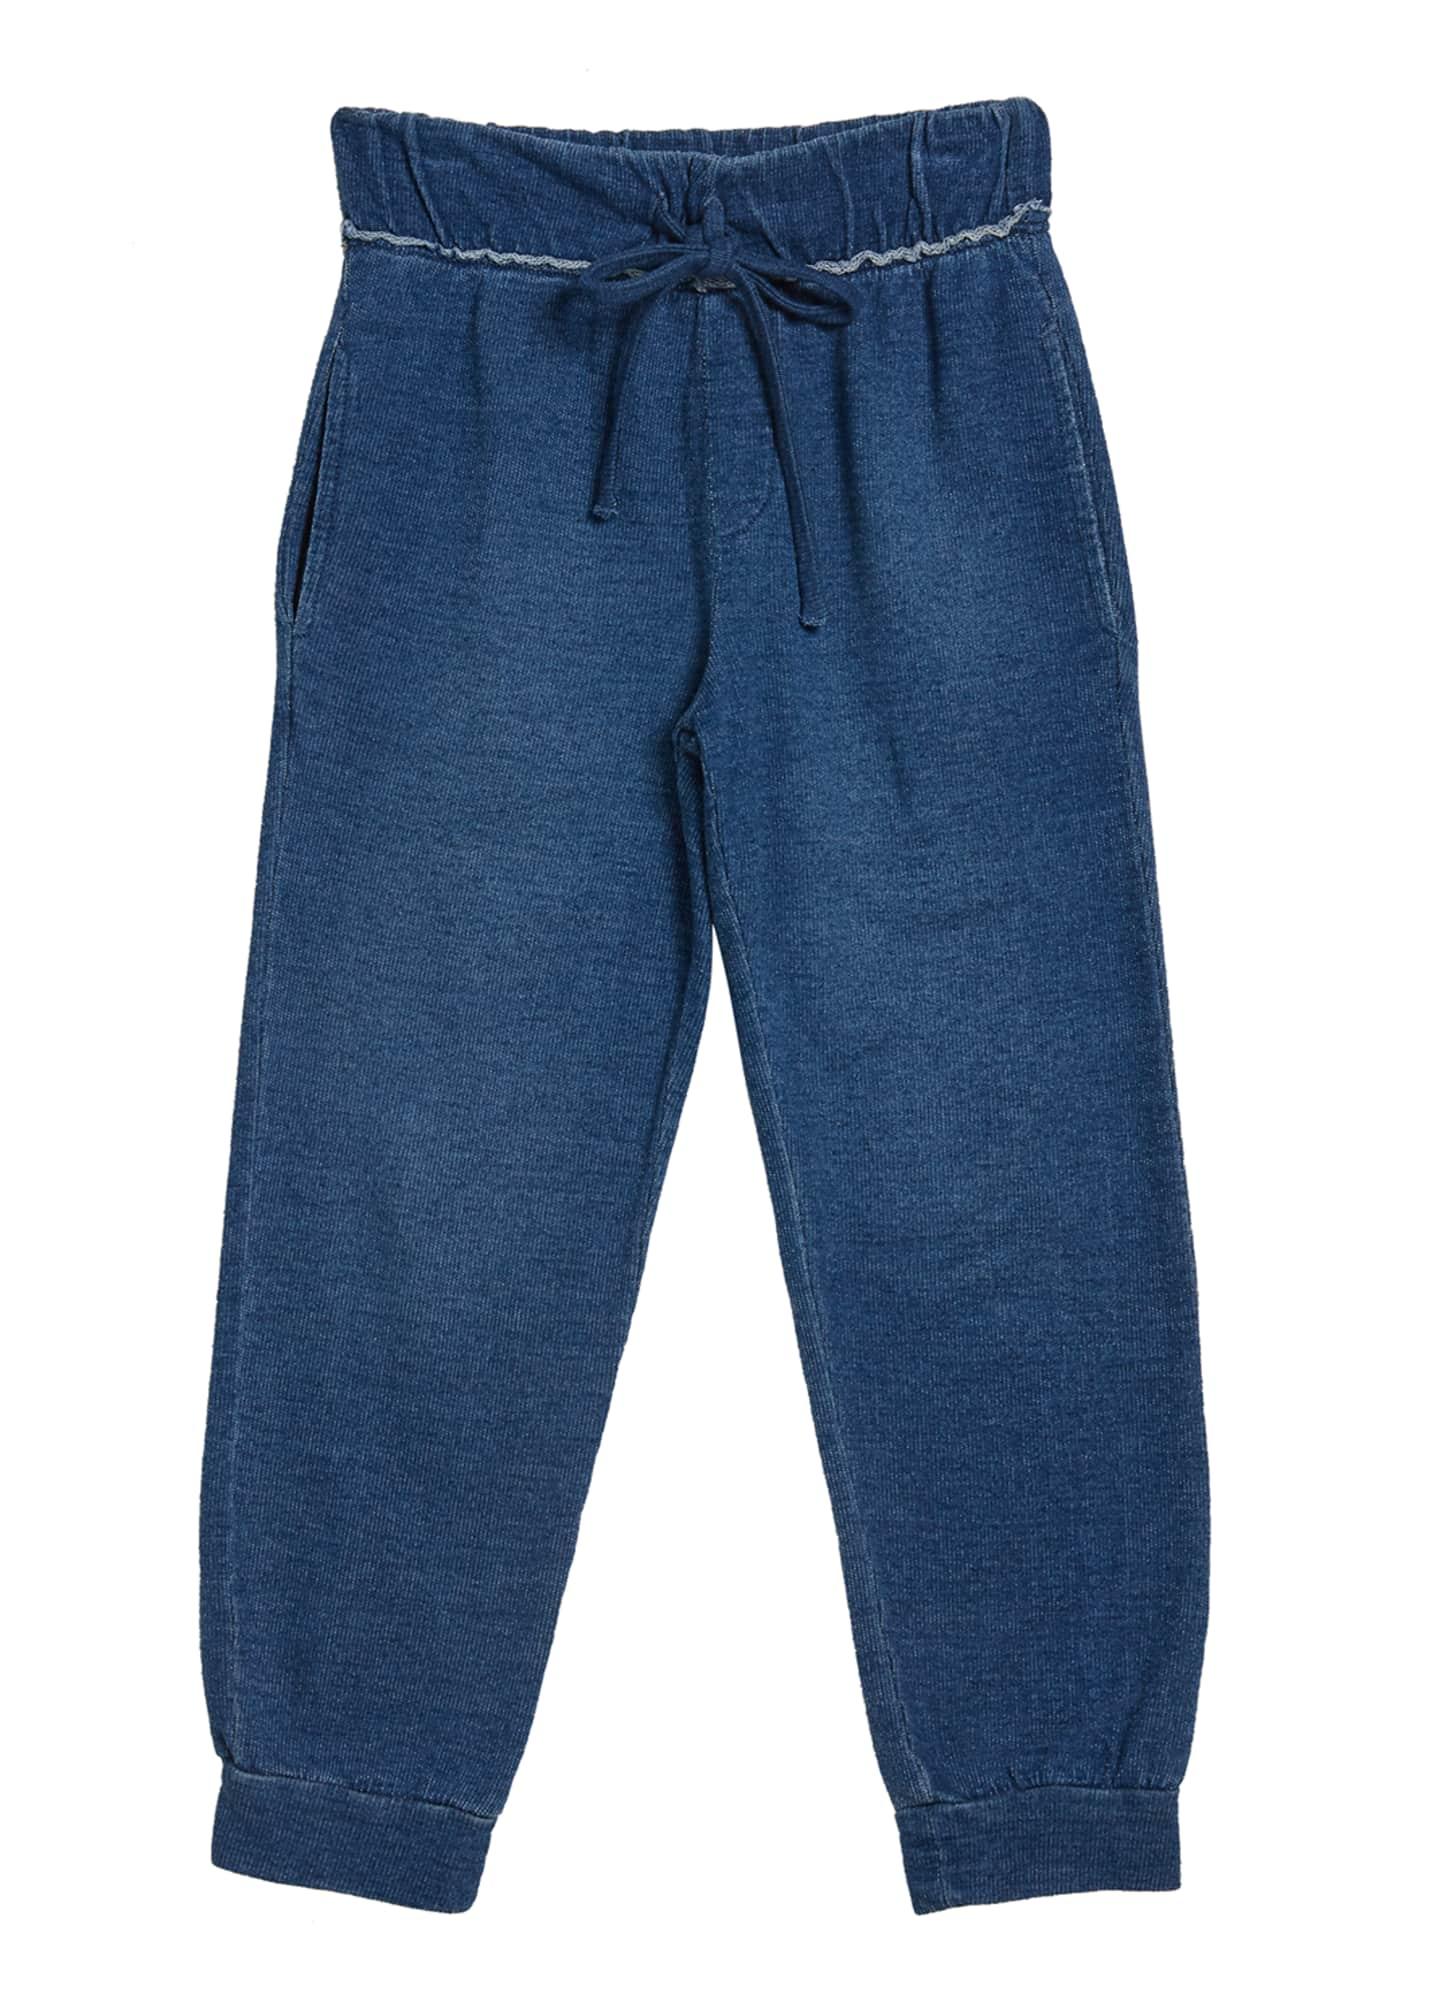 Bella Dahl Girl's Fray Waist Jogger Pants, Size